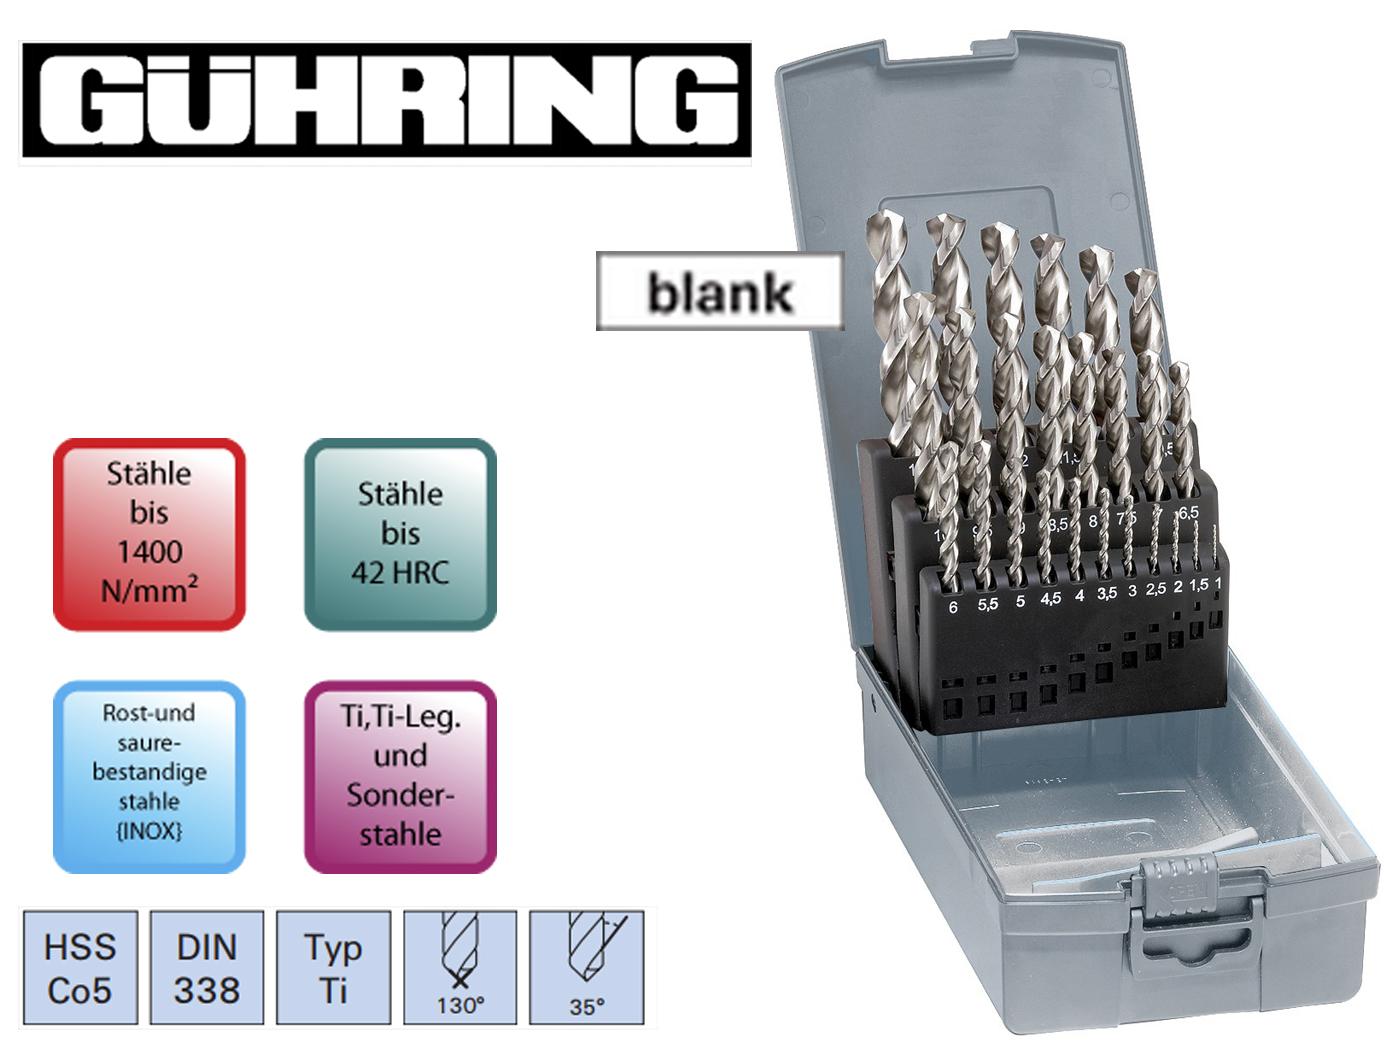 Spiraalborenset DIN 338 Ti HSSECo5 Guhring | DKMTools - DKM Tools